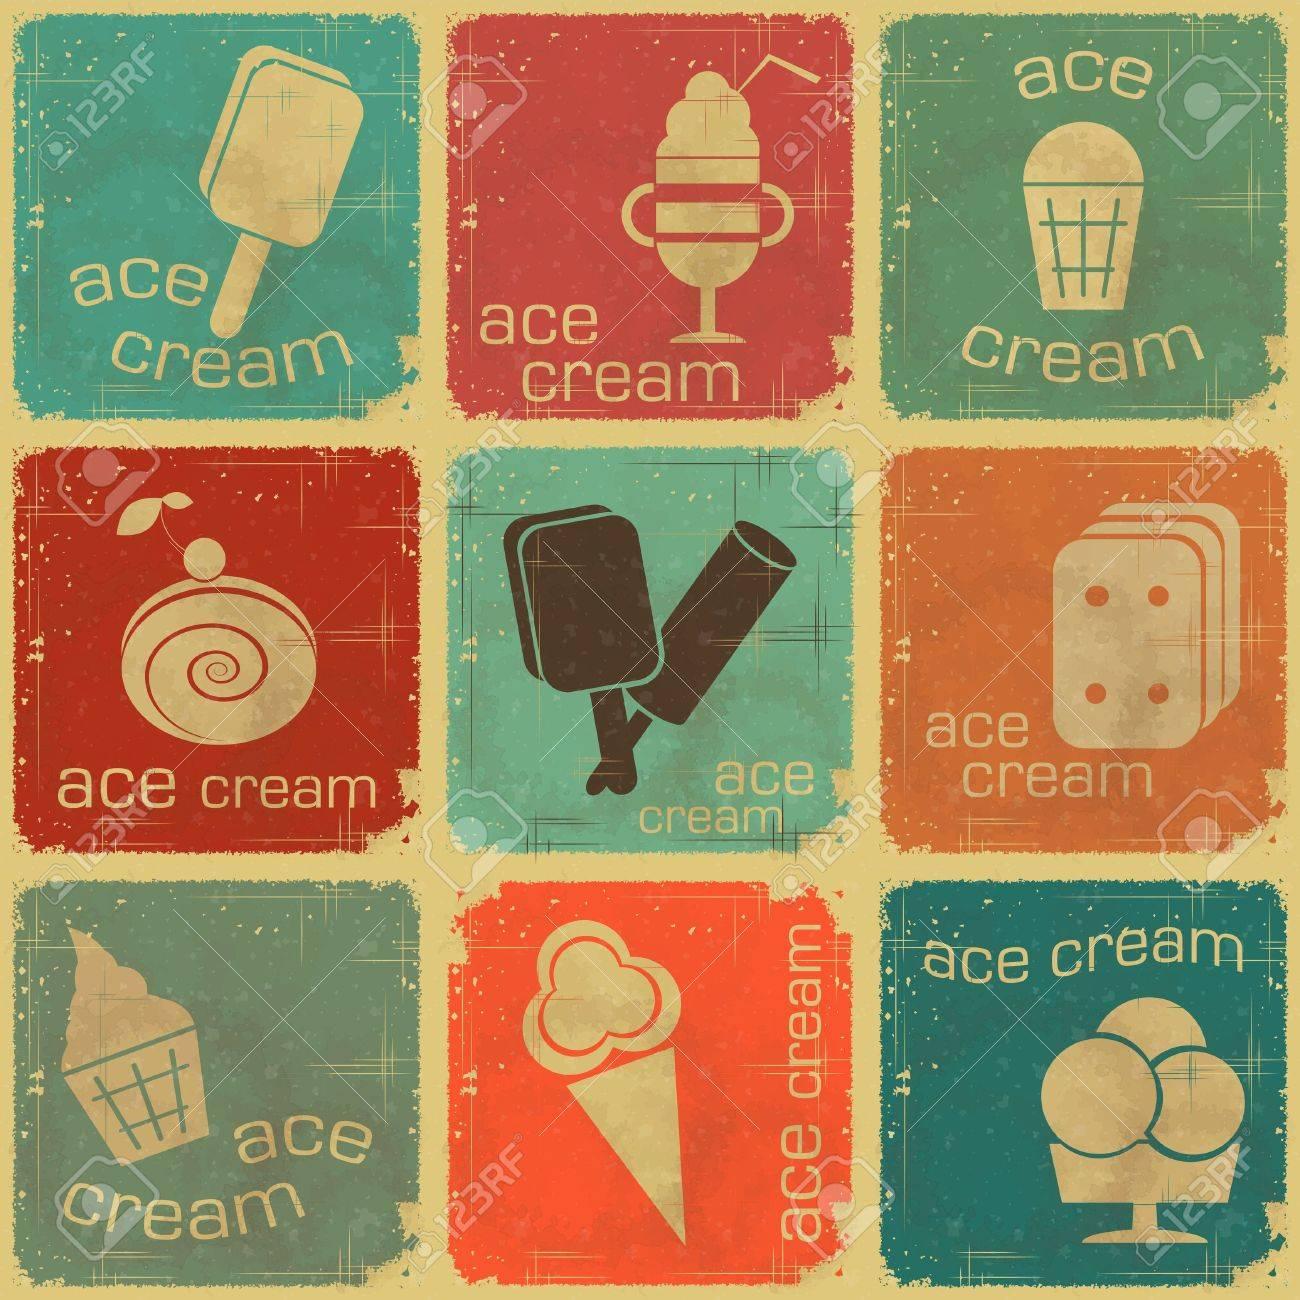 Ice Cream Label Template. hand drawn label textured ice cream stock ...